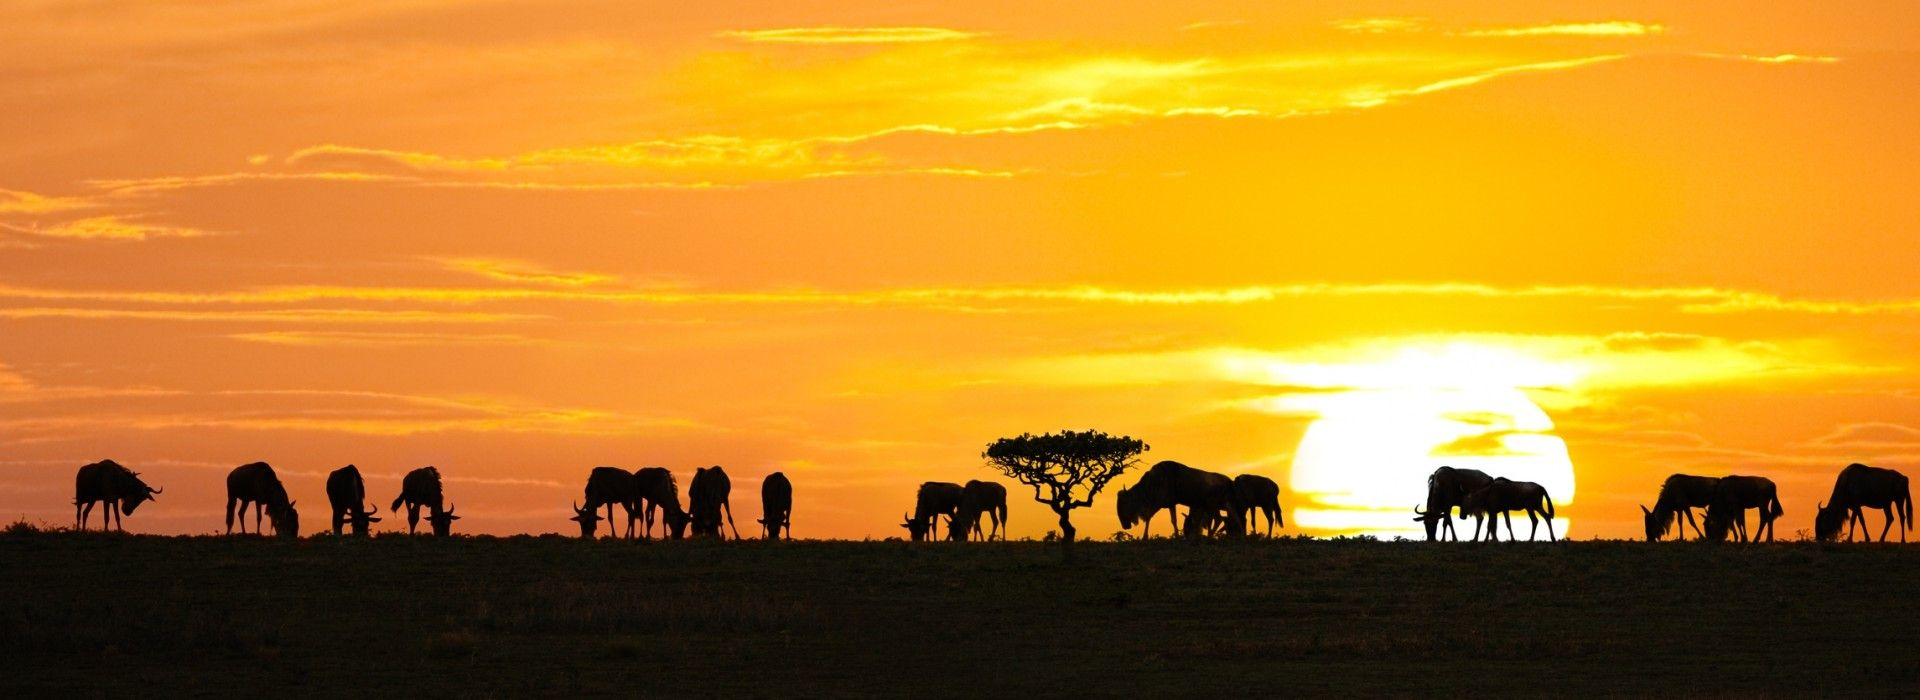 Adventure Tours in Tanzania Safari Parks